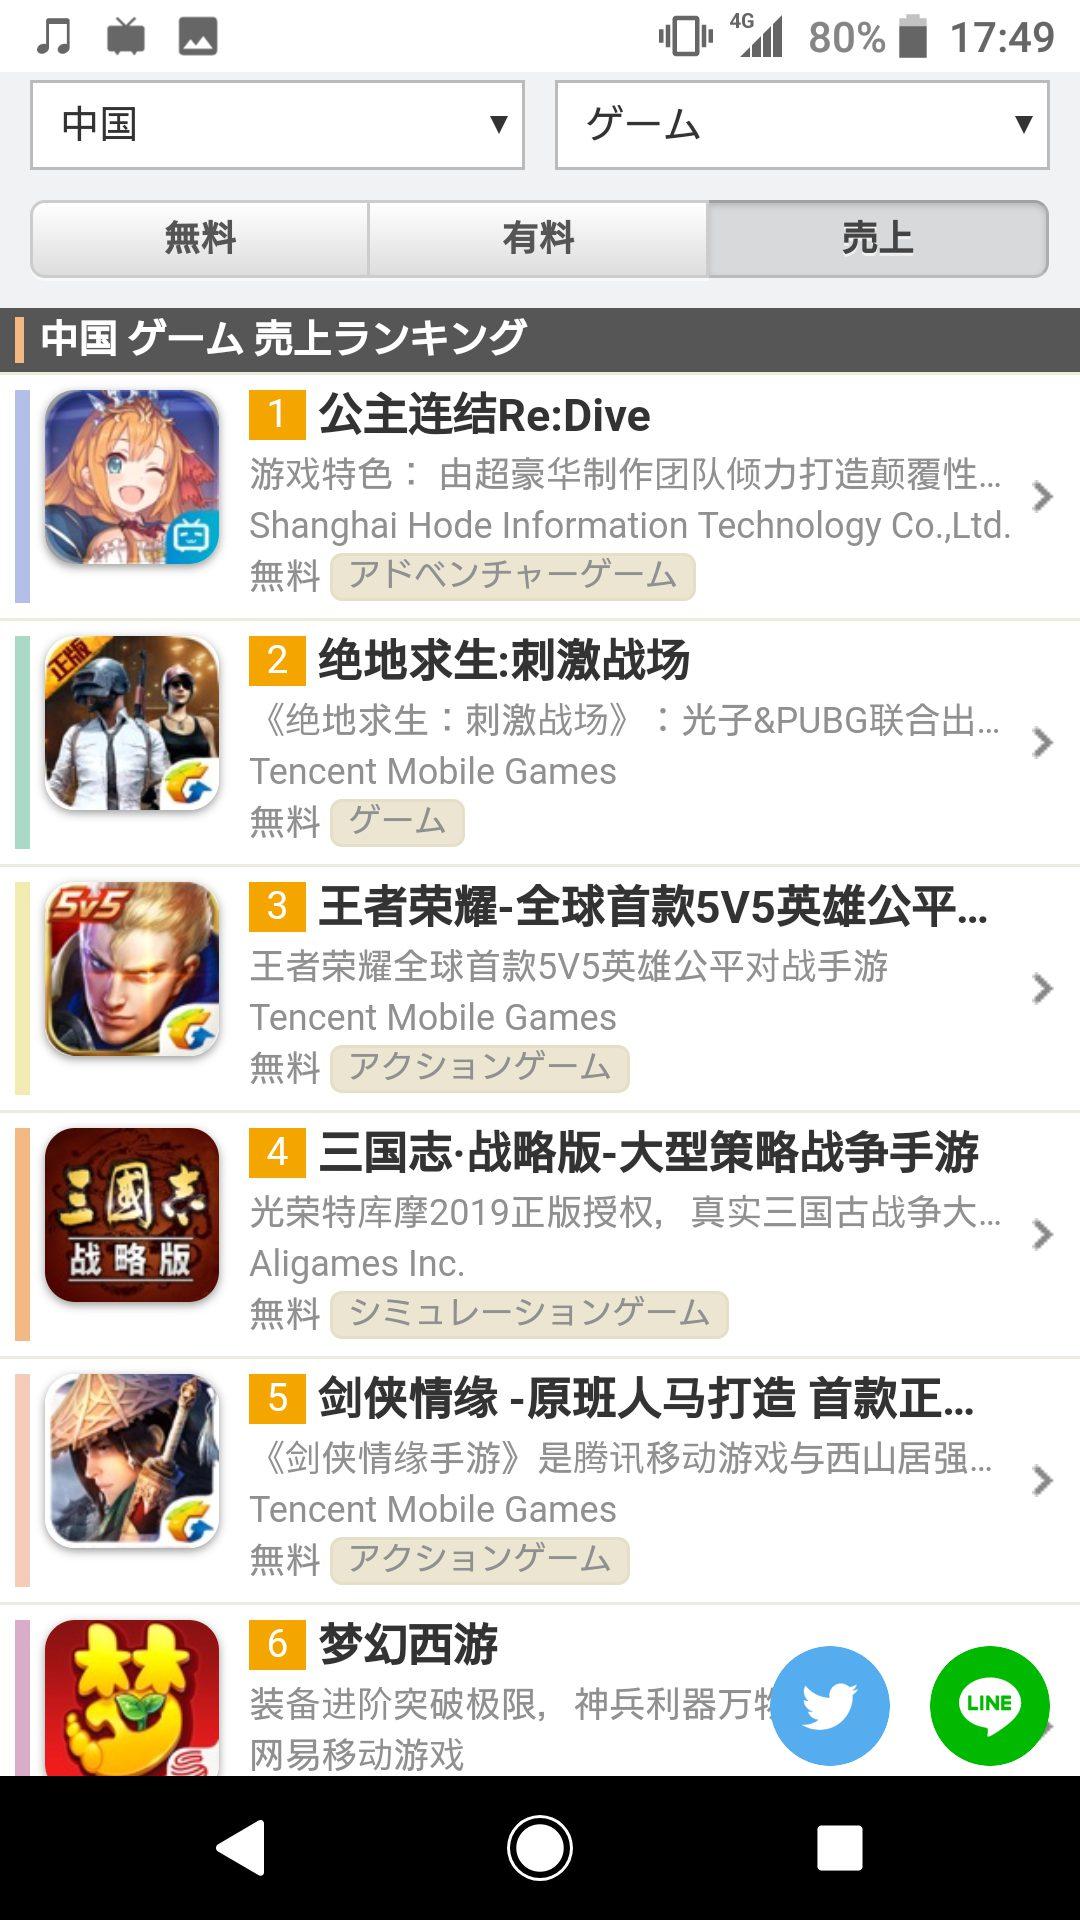 mEsou2d - 【速報】プリコネ、中国で配信後5日で15億売れる